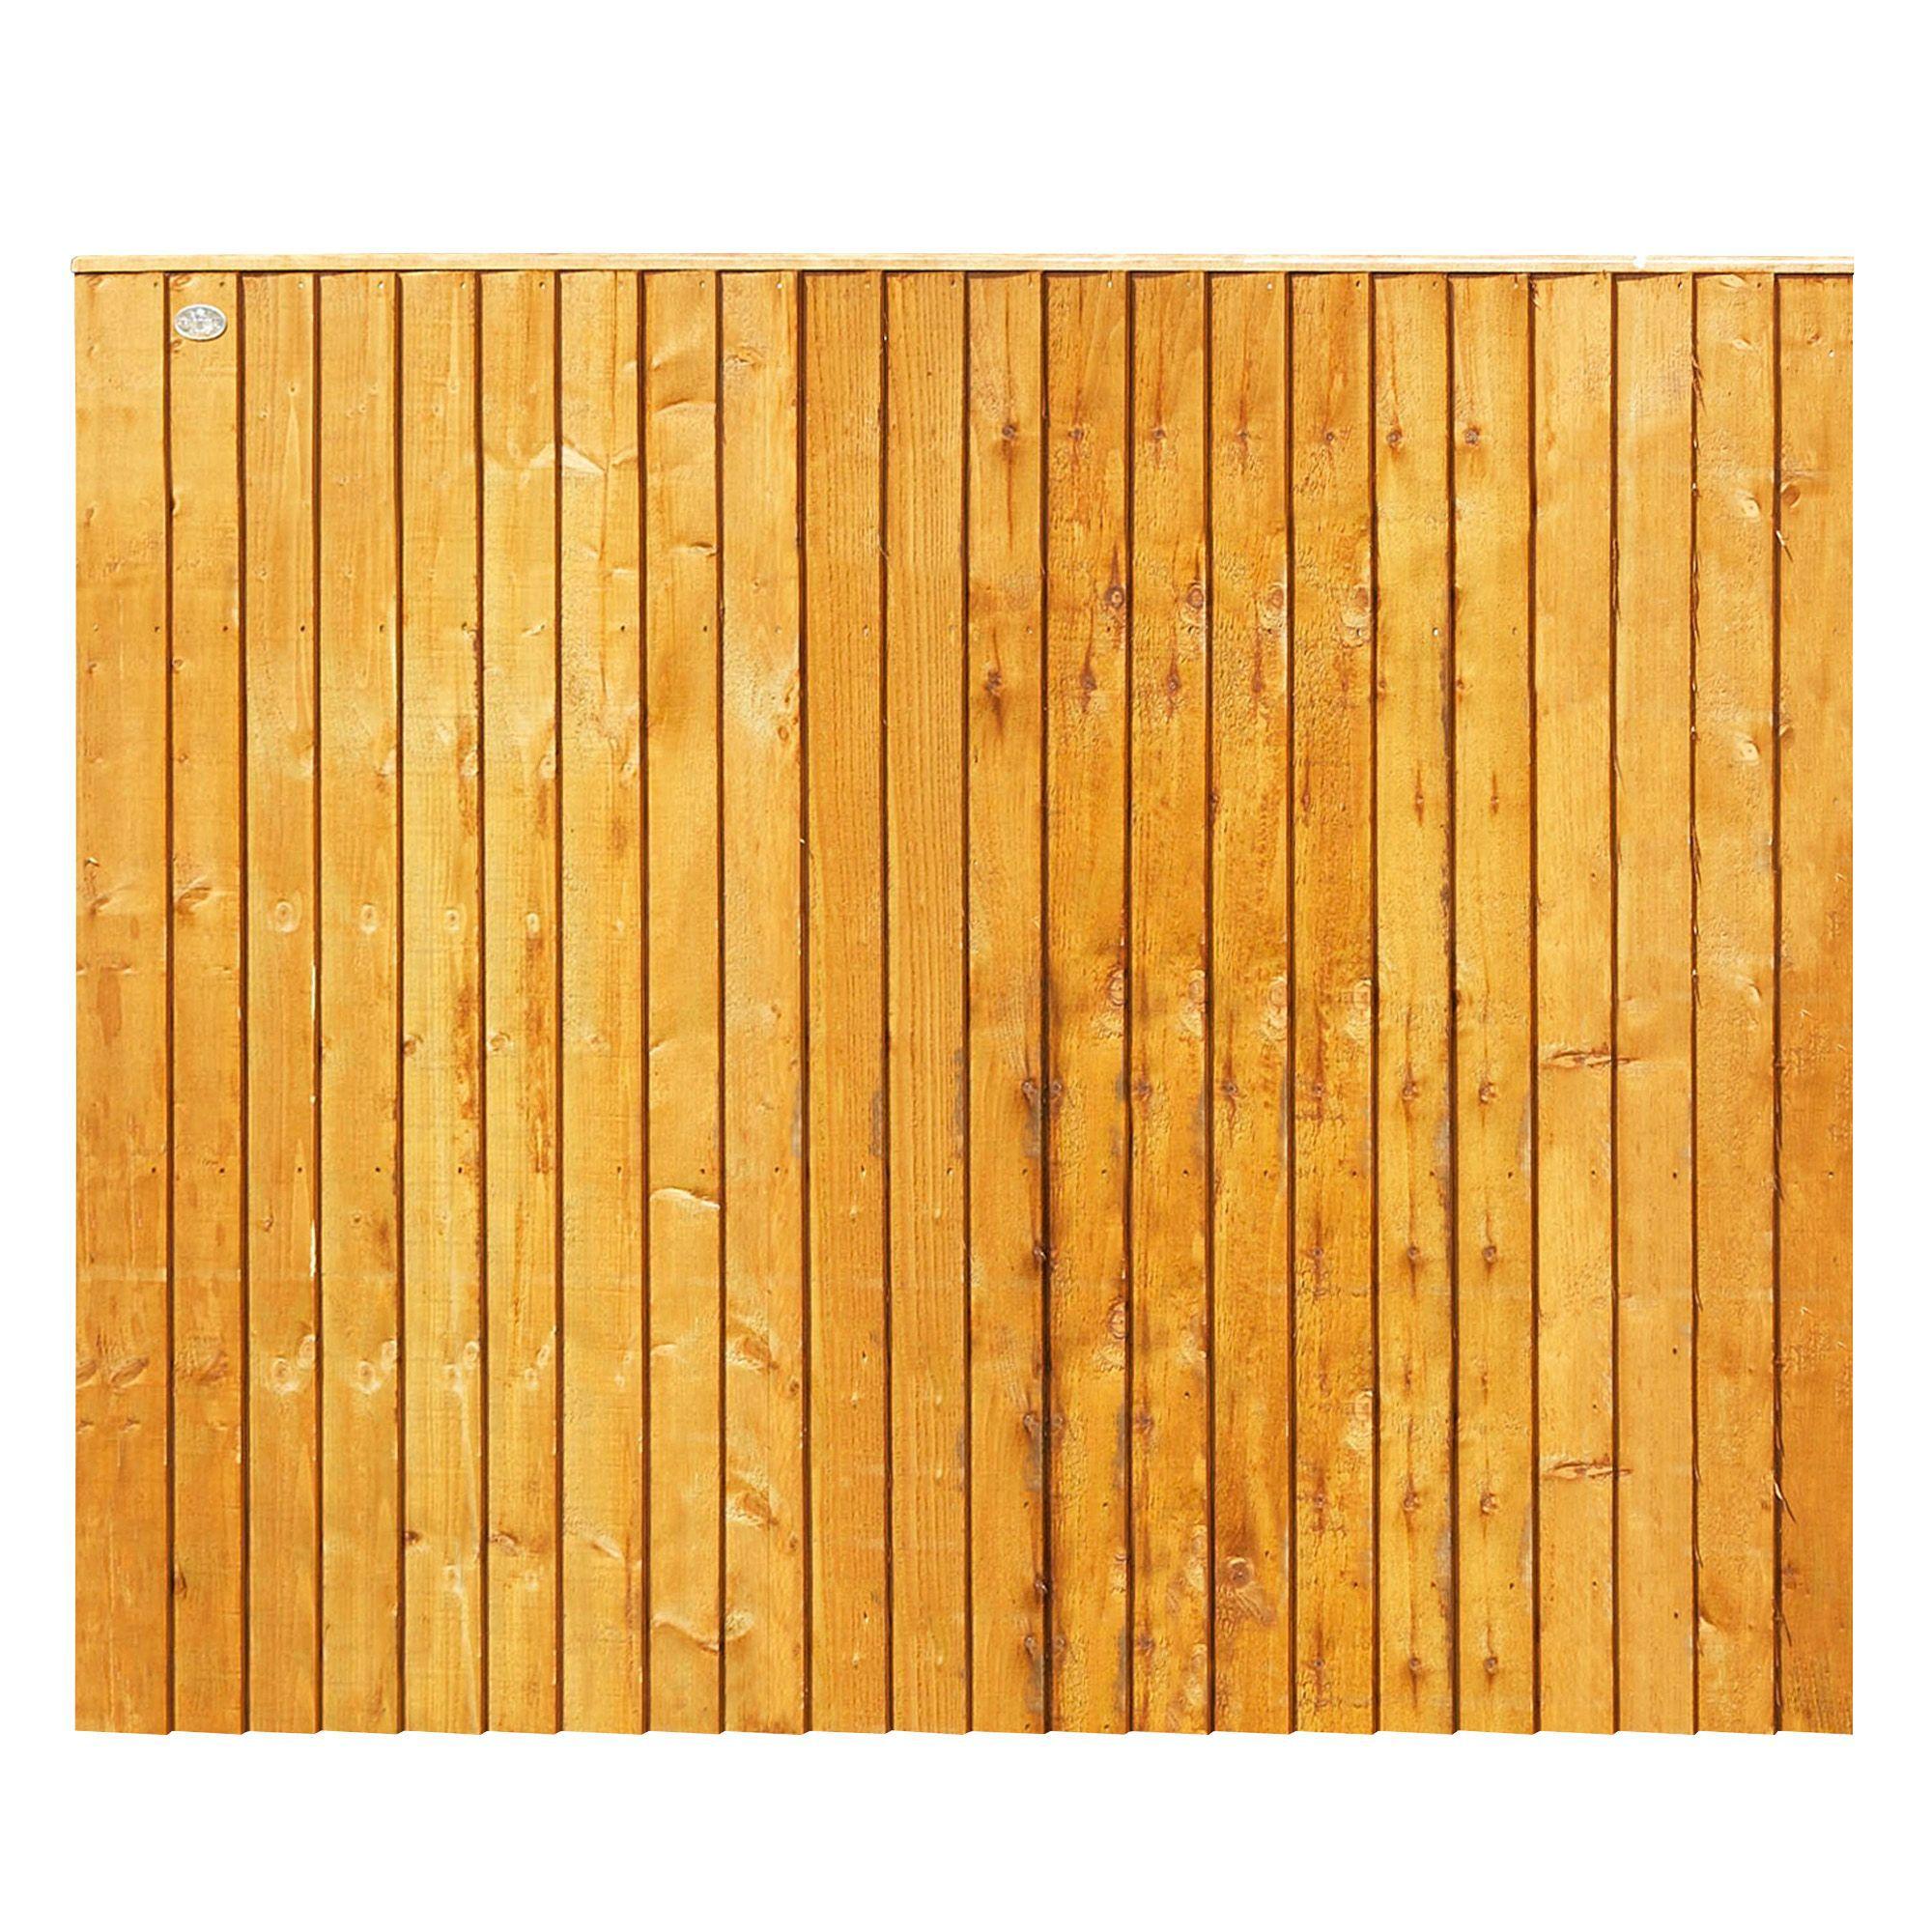 Lap Closeboard Vertical Square Edged